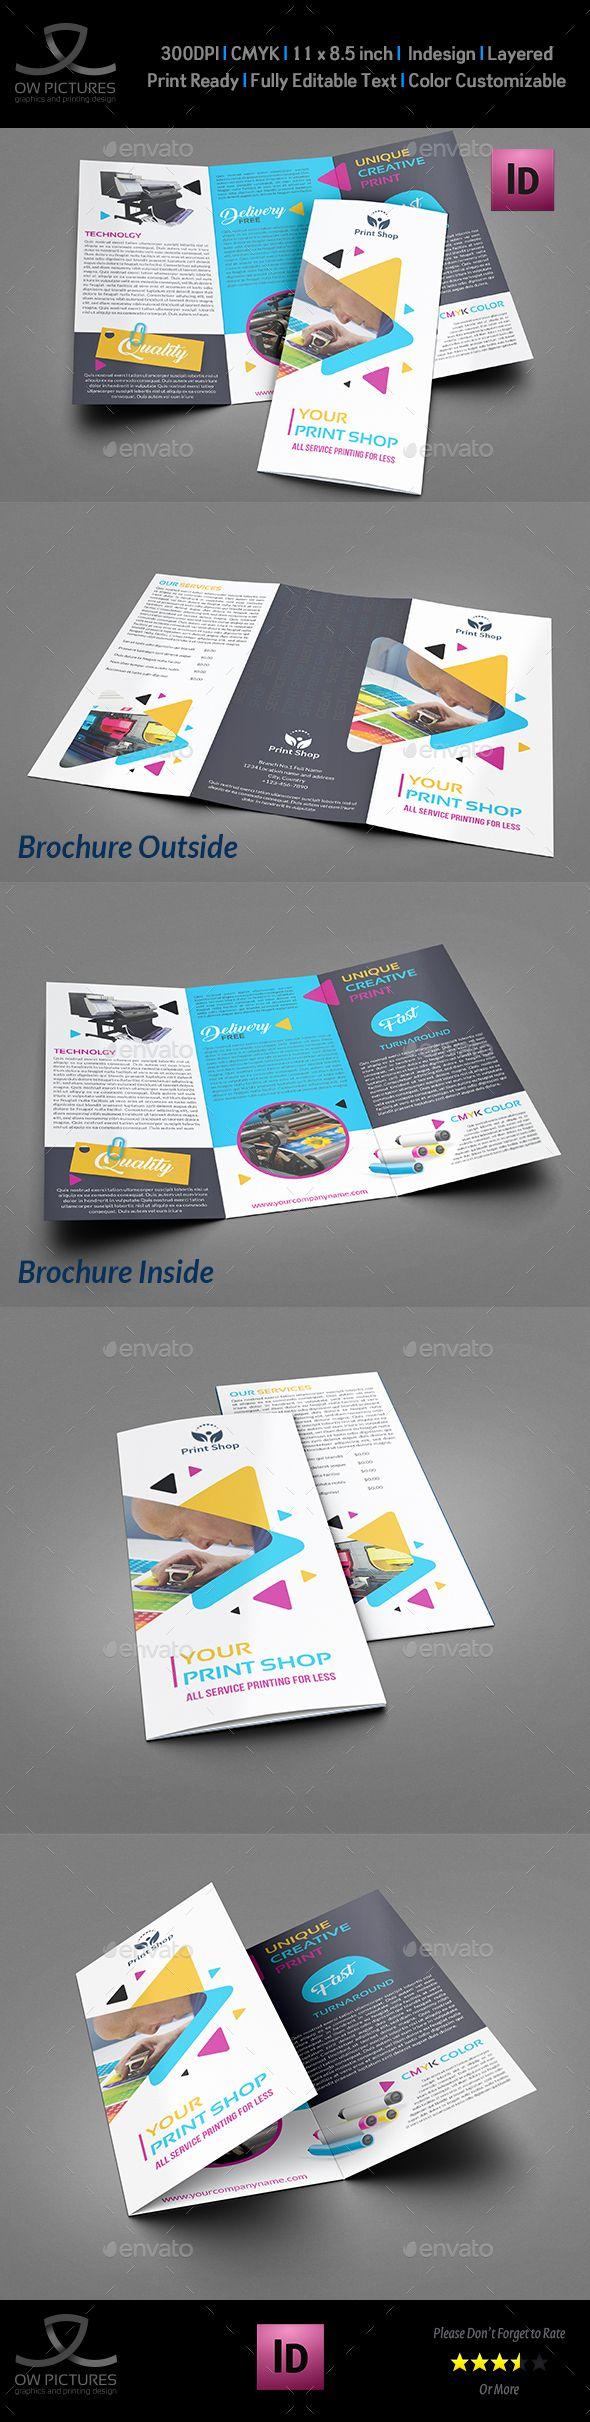 pin by ramesh kumar on brochures pinterest brochure design